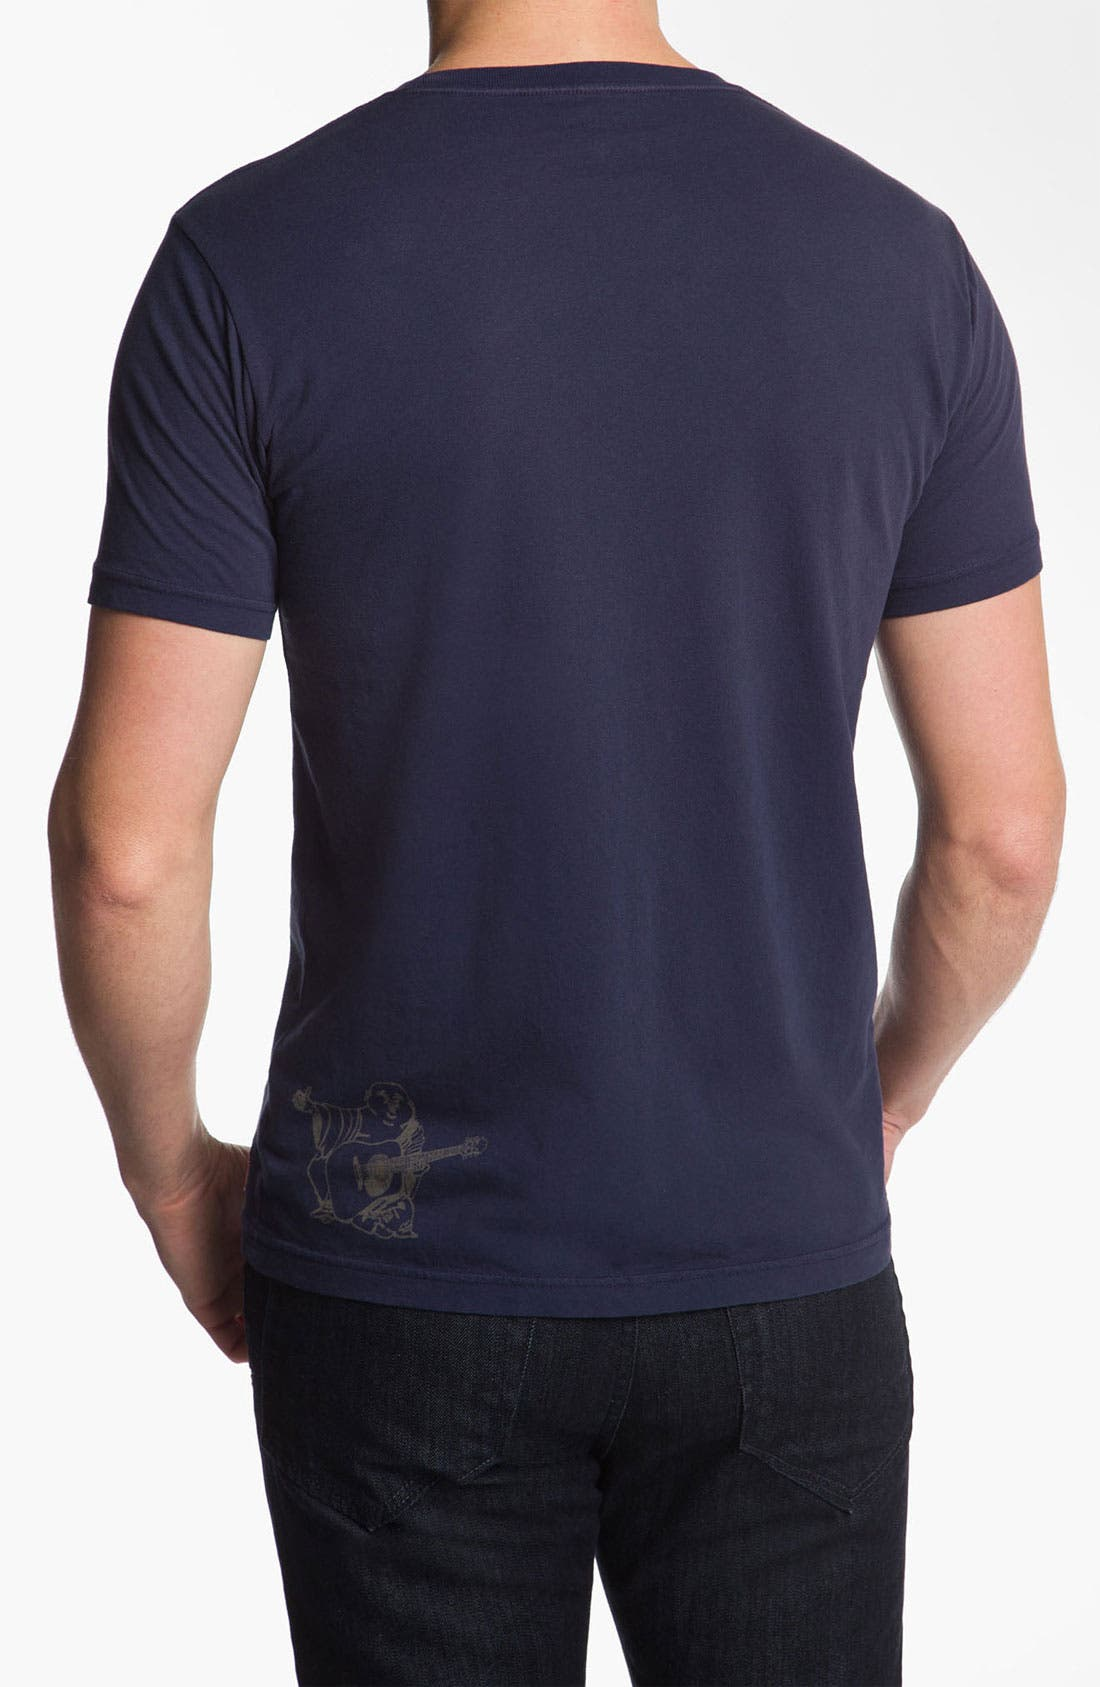 Alternate Image 2  - True Religion Brand Jeans 'Soda Pop' T-Shirt